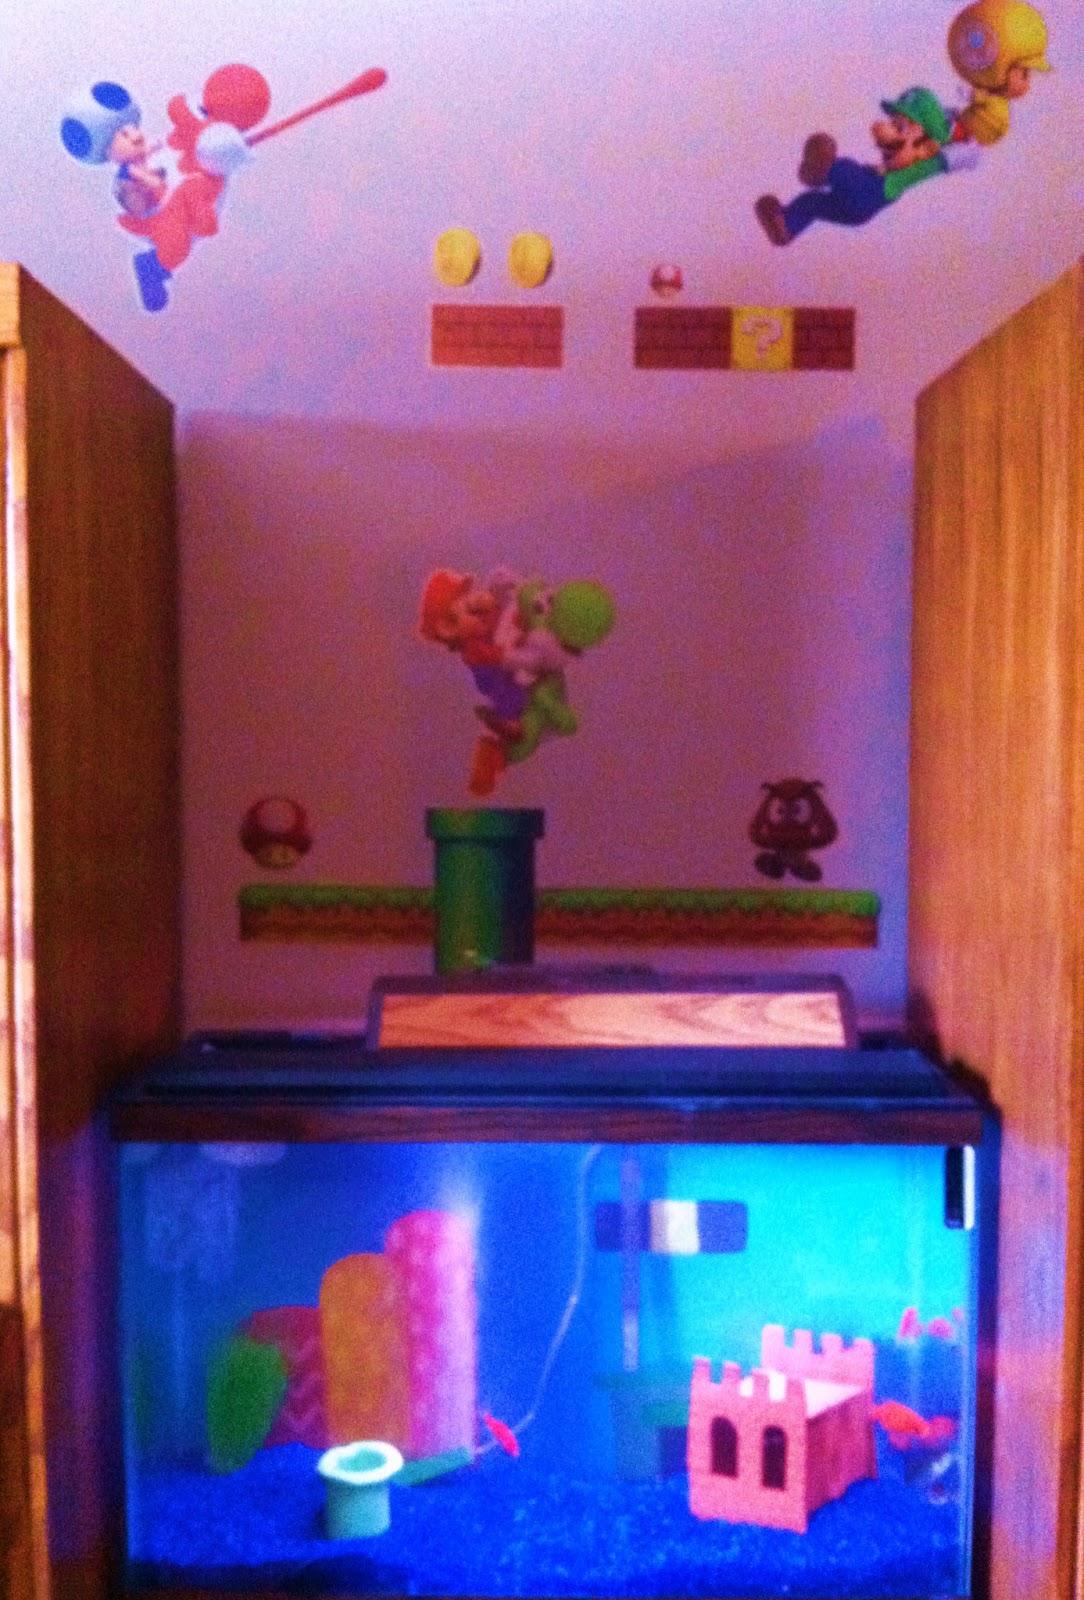 Project super mario themed aquarium americangoodz for Mario fish tank